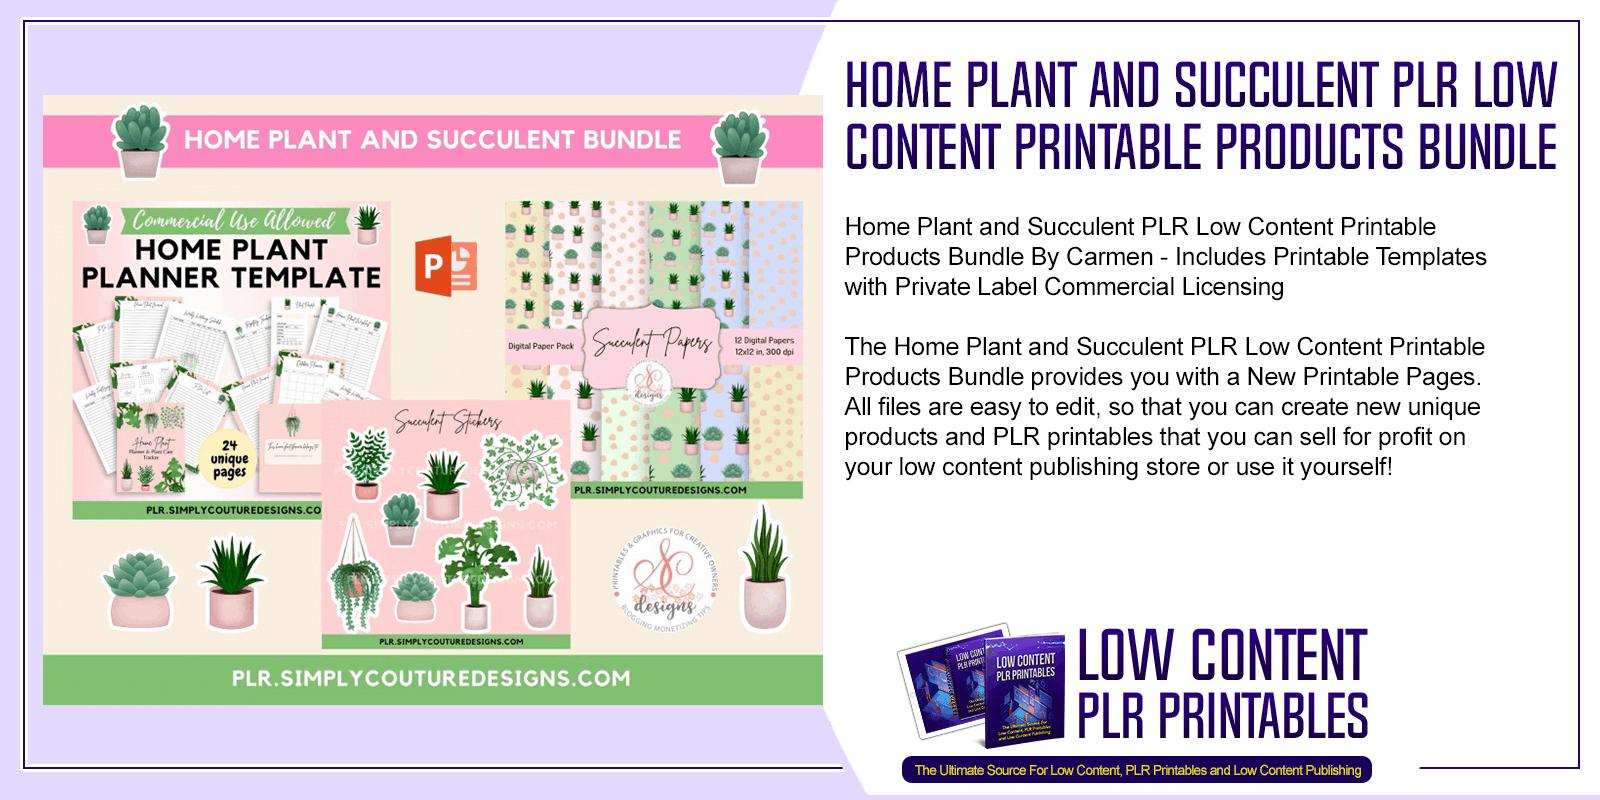 Home Plant and Succulent PLR Low Content Printable Products Bundle